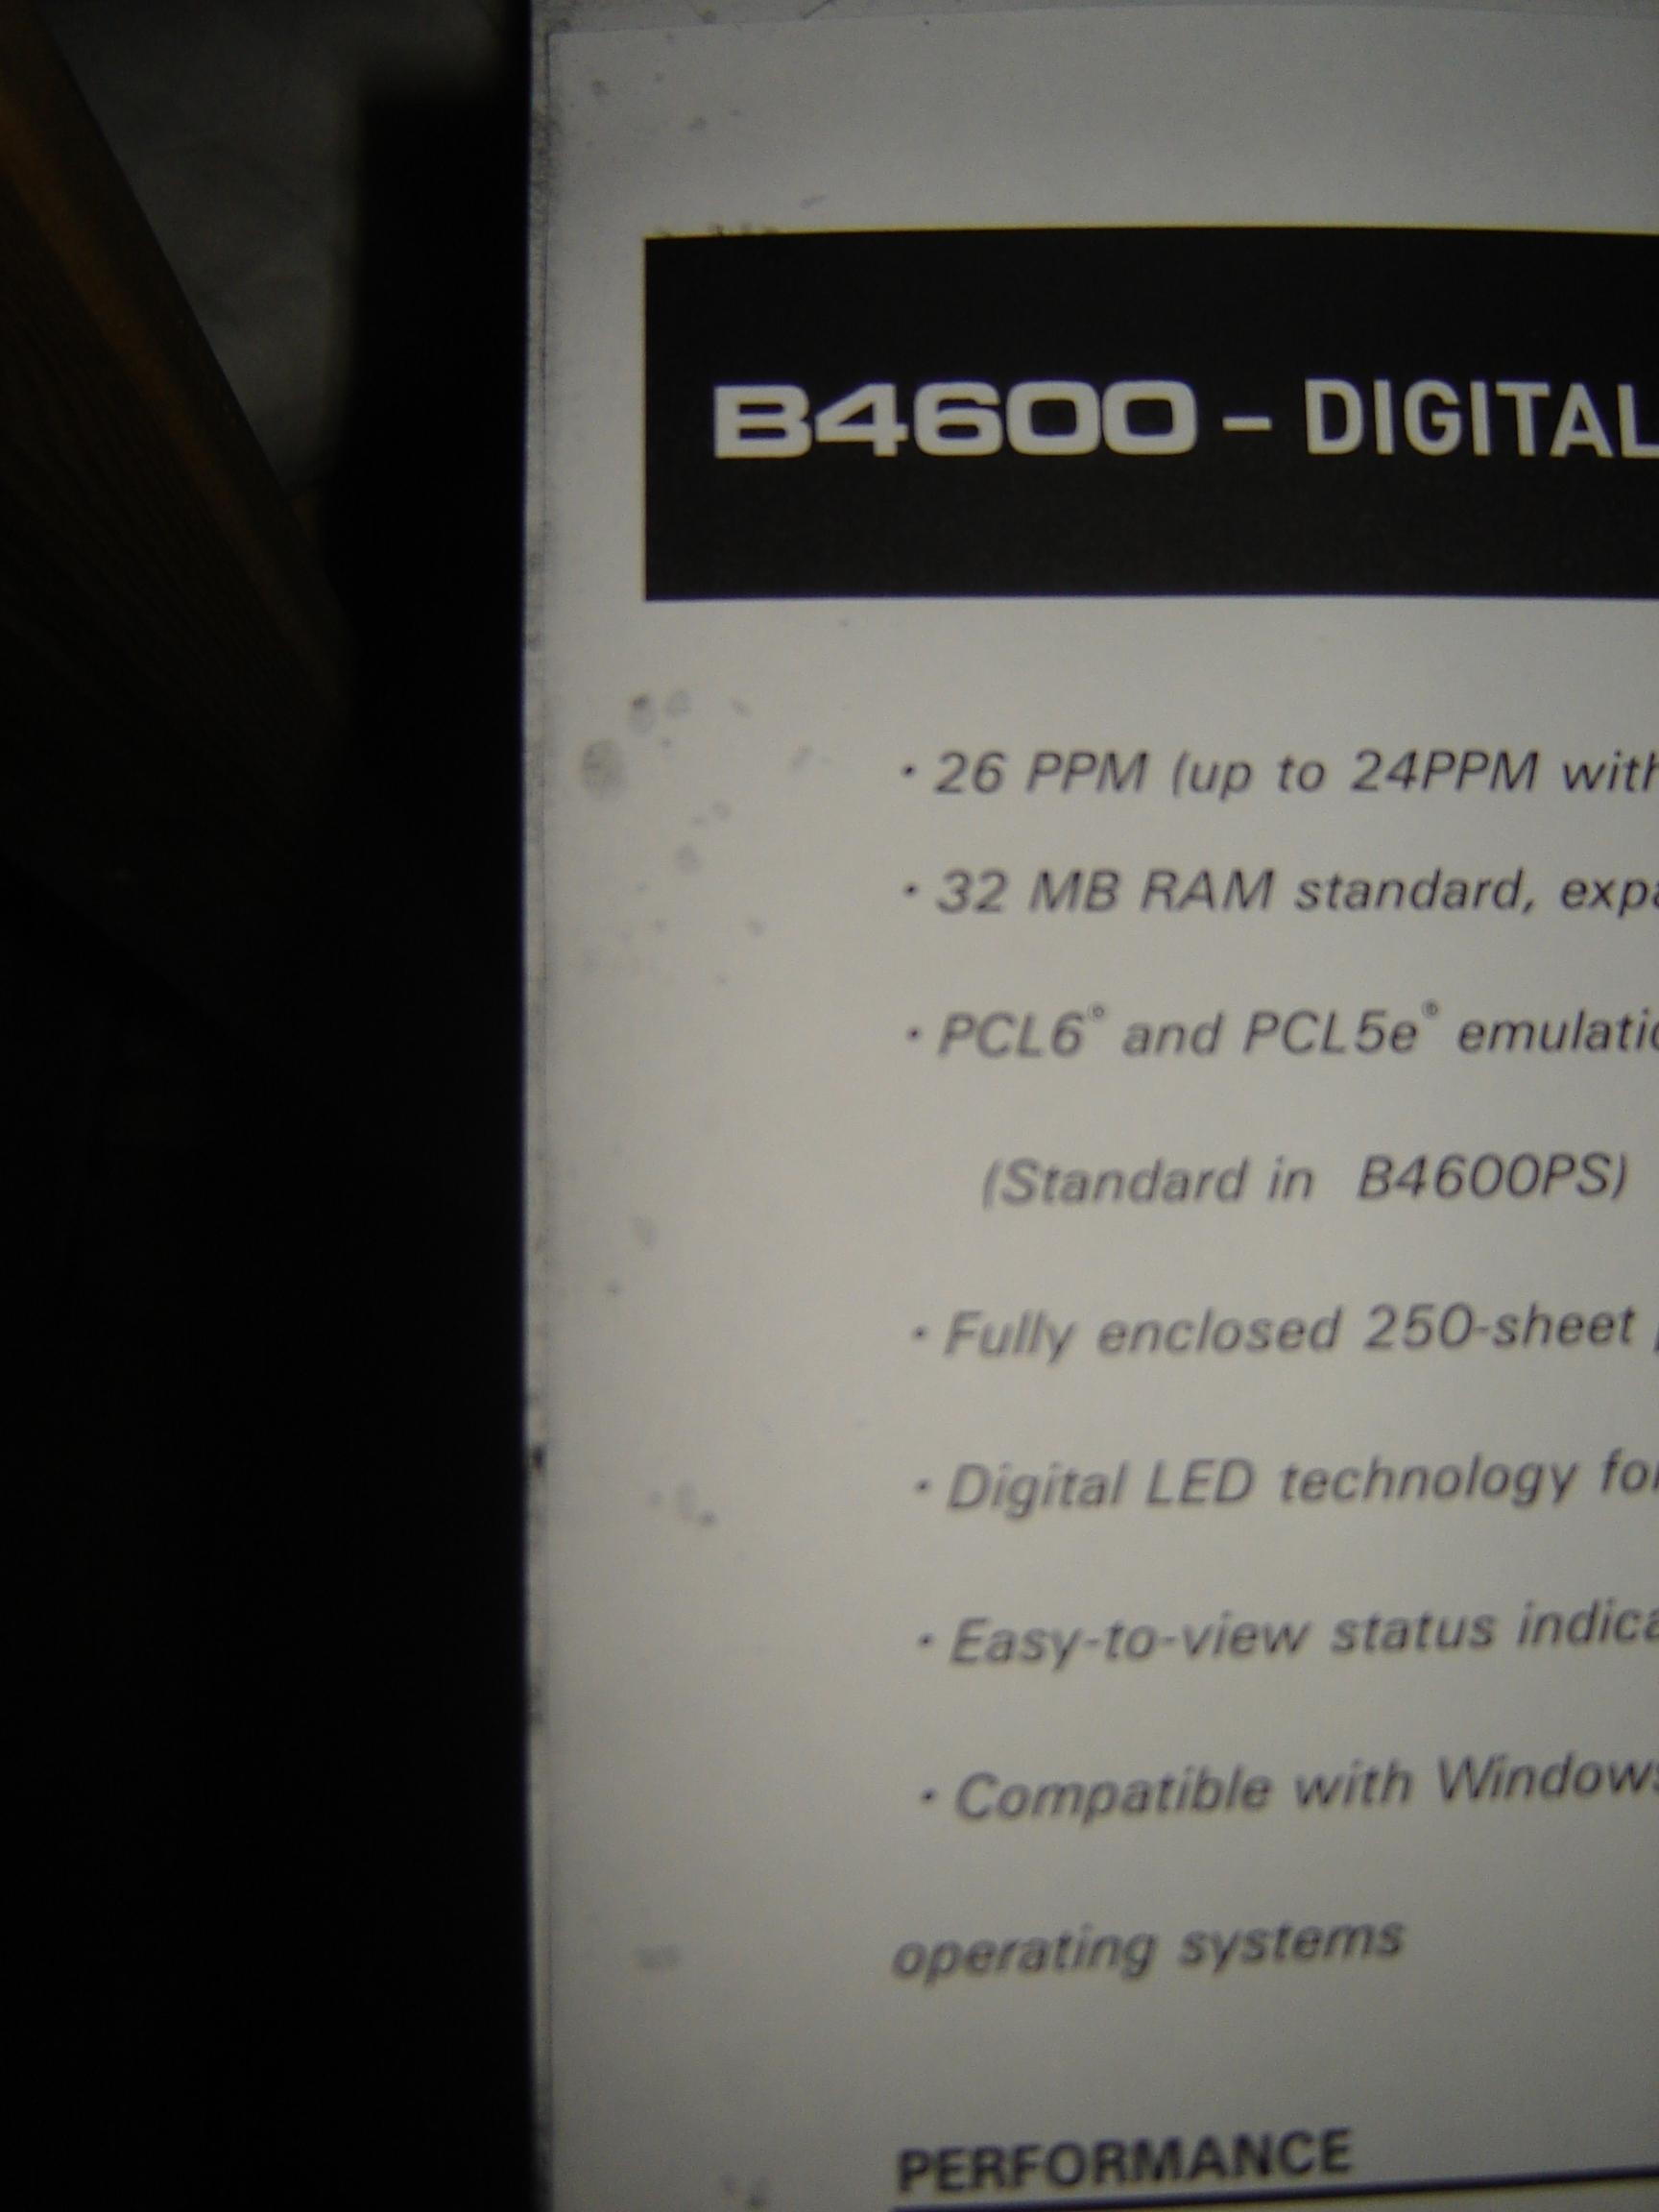 OKI B4600 plamki na wydruku